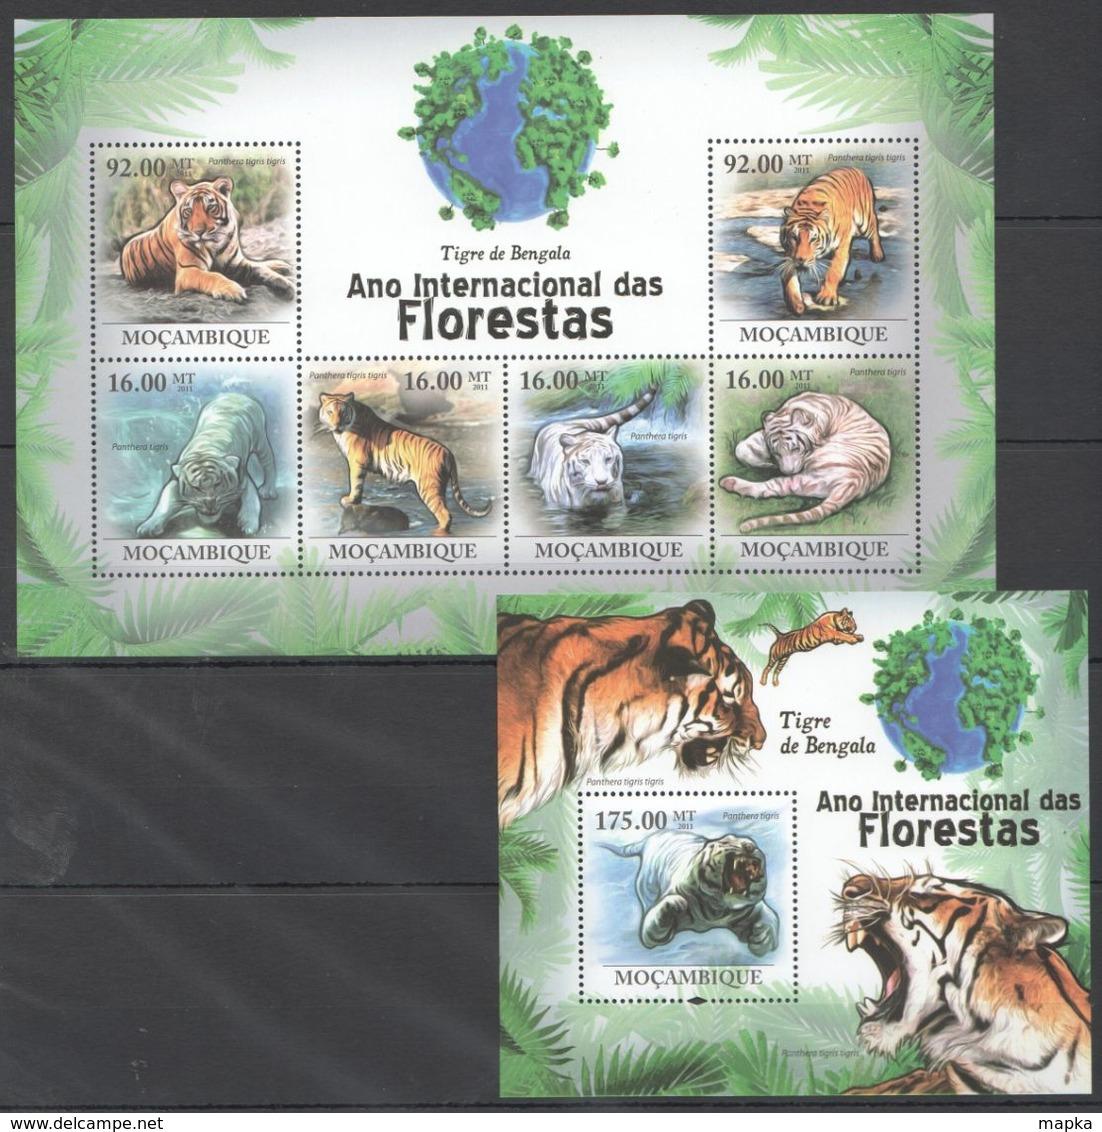 QQ128 2011 MOZAMBIQUE MOCAMBIQUE FAUNA DAS FLORESTAS ANIMALS TIGRE DE BENGALA 1SH+1BL MNH - Felini